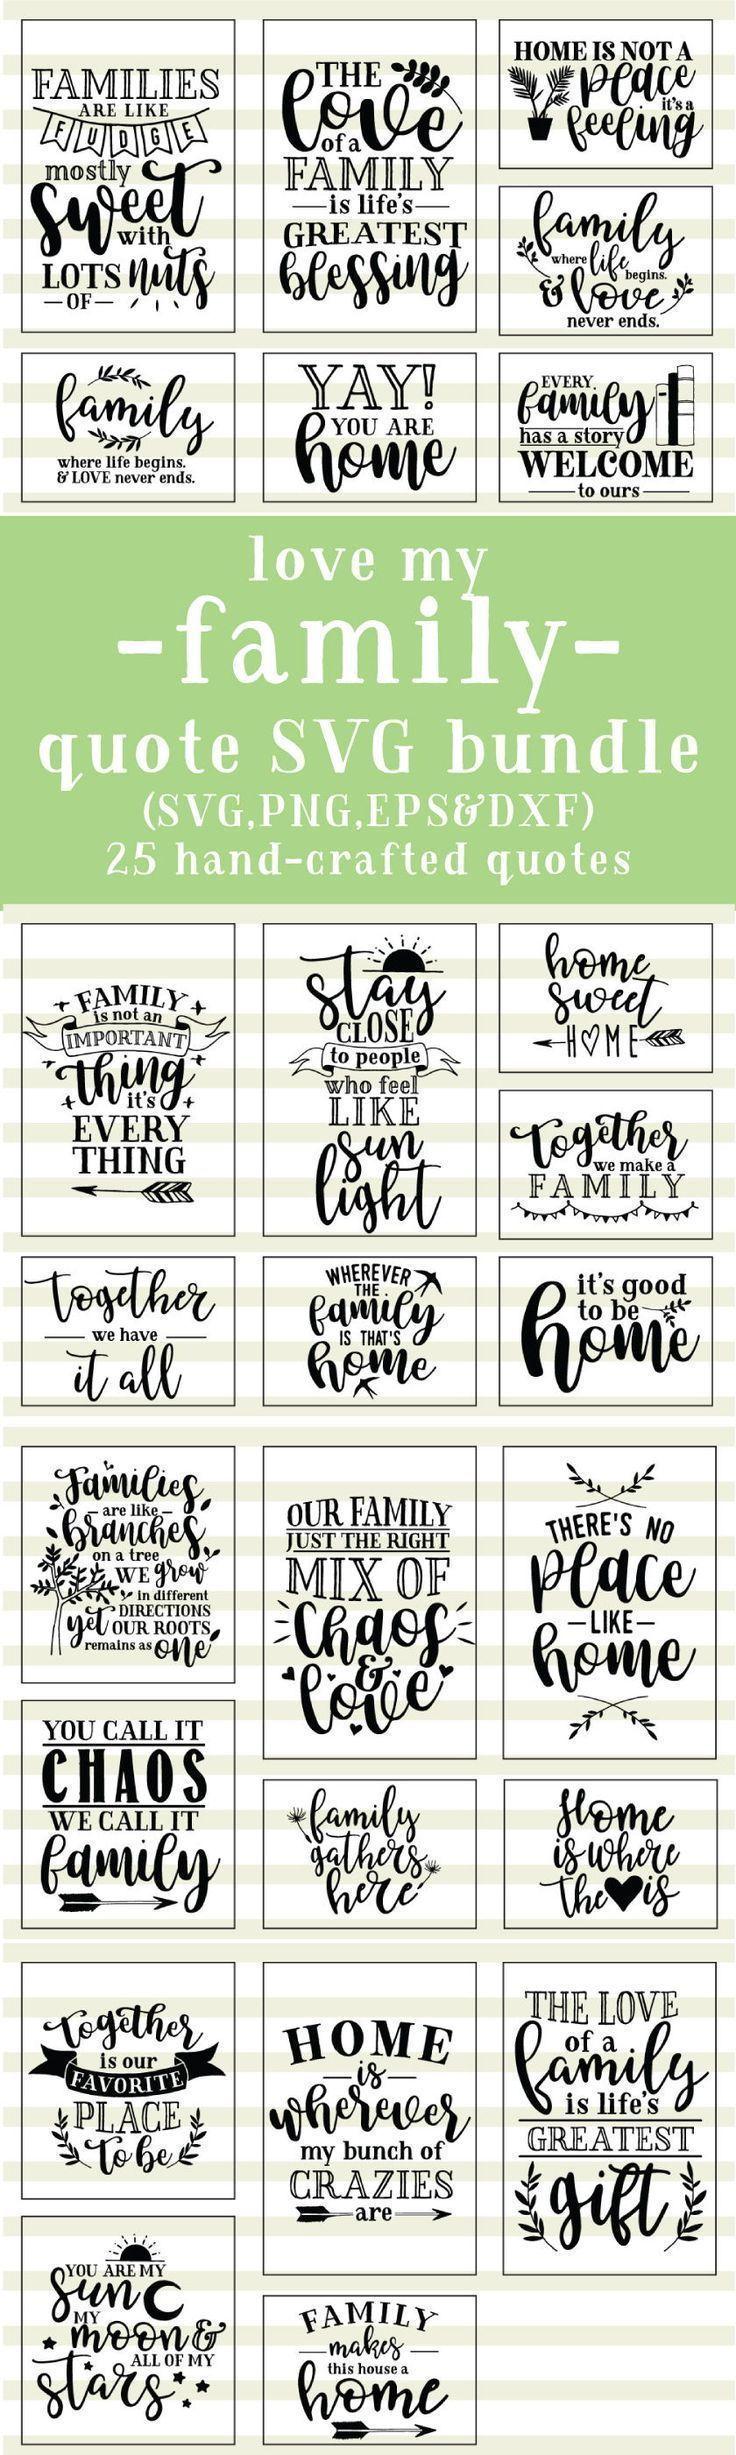 Family Love Quotes SVG Cut File Bundle Deal | Cut File for Cricut & Cameo Silhouette | Quote DXF Cut